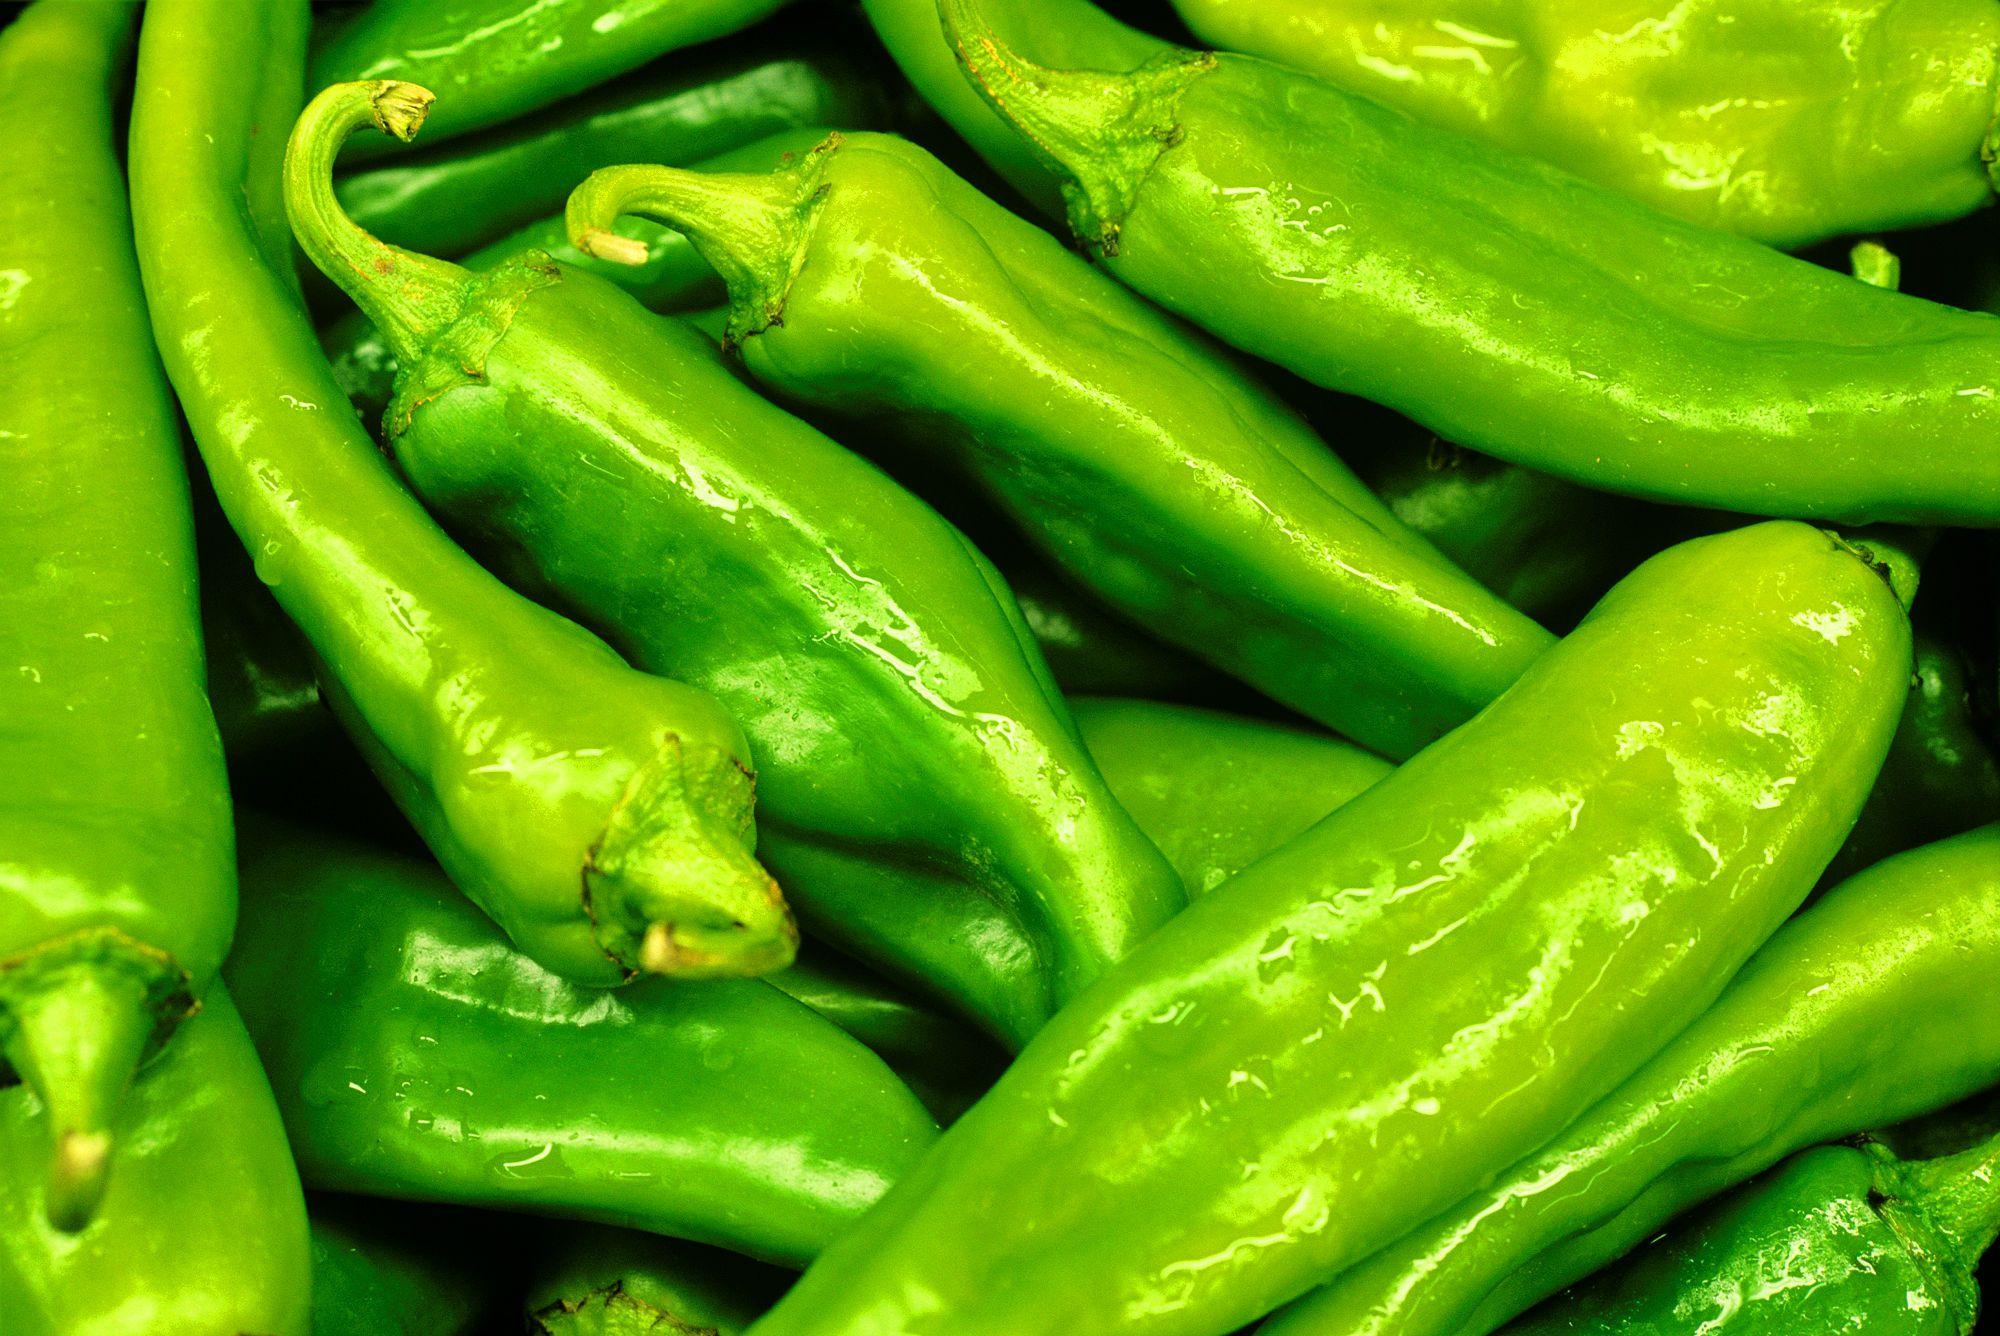 Descriptions Of Popular Mexican Fresh Green Chiles